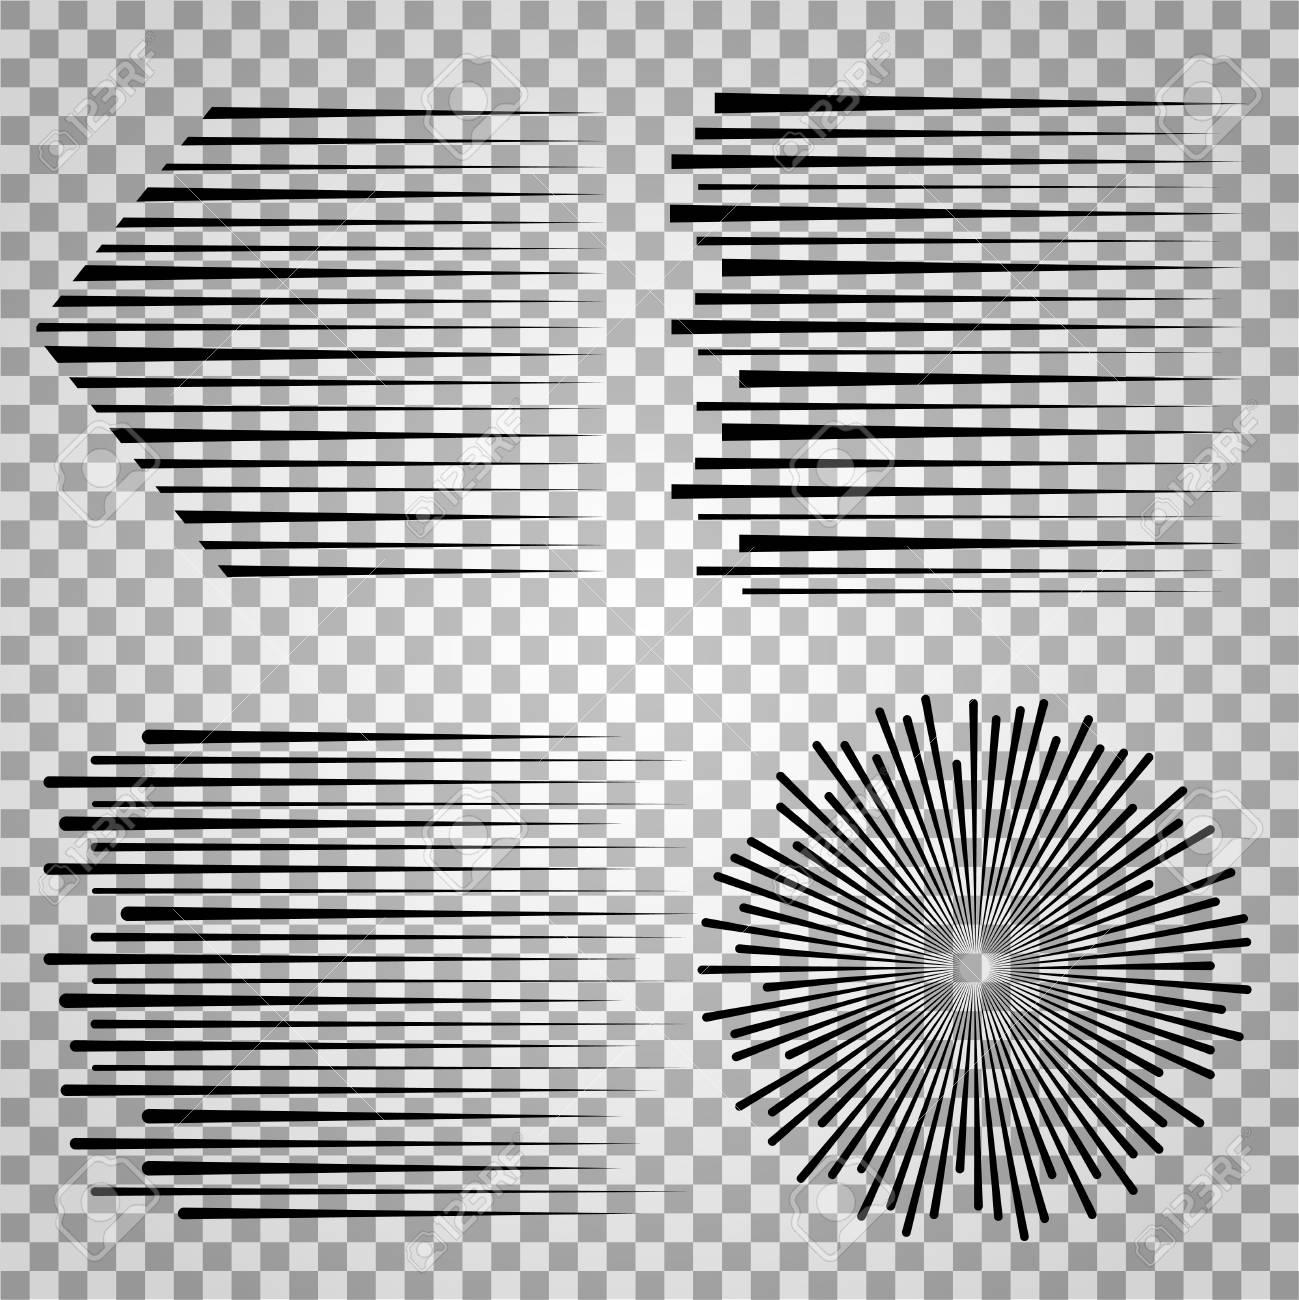 Sketch force and motion fast lines on transparent background radial line effect illustration